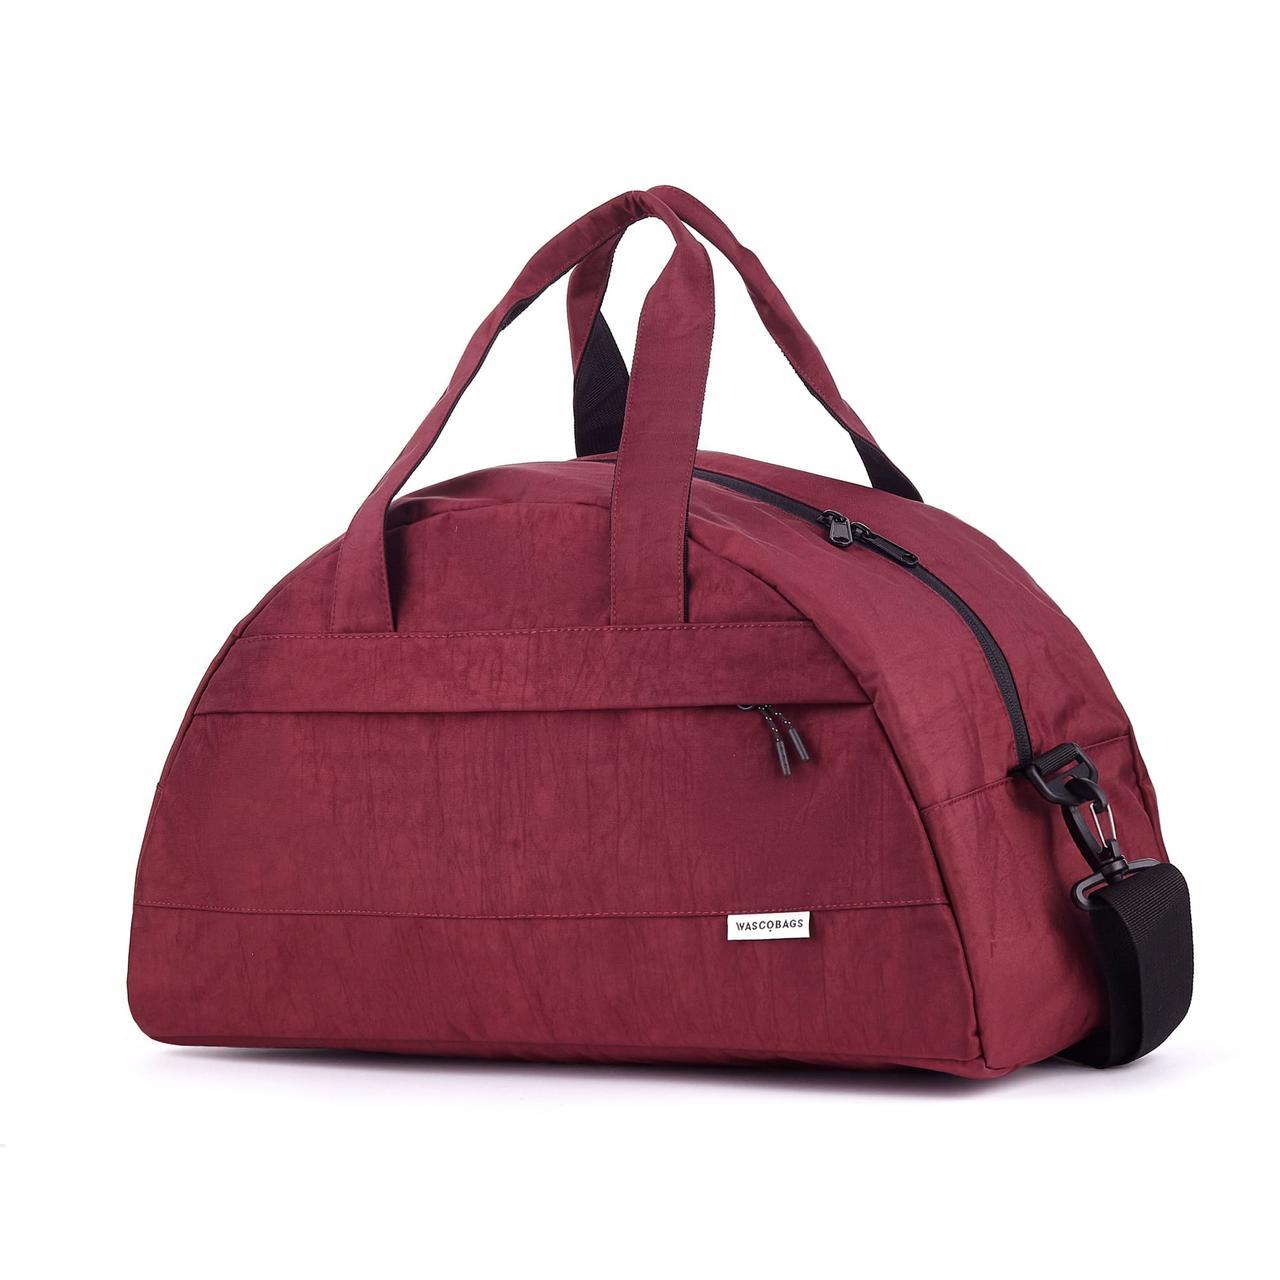 Дорожная сумка Wascobags Valencia Бордо (25 L)